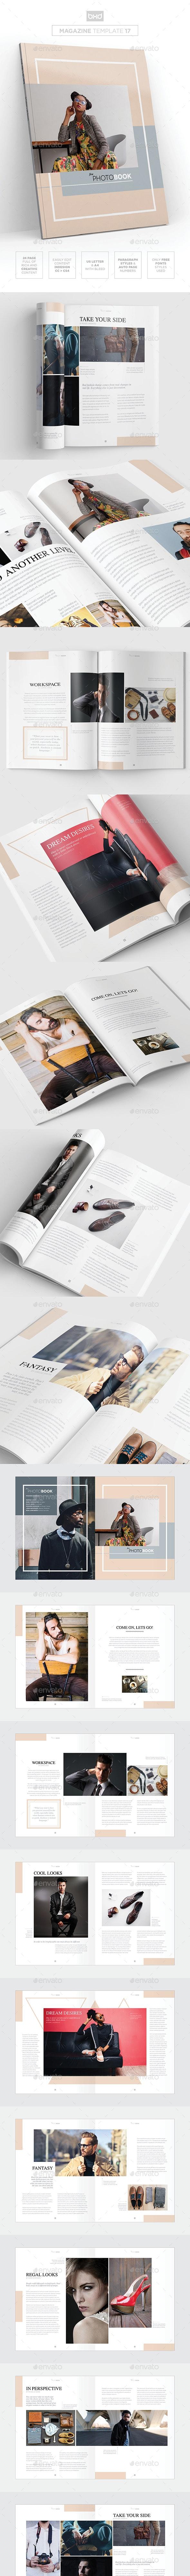 Magazine/Lookbook Template InDesign & Photoshop 05 - Magazines Print Templates